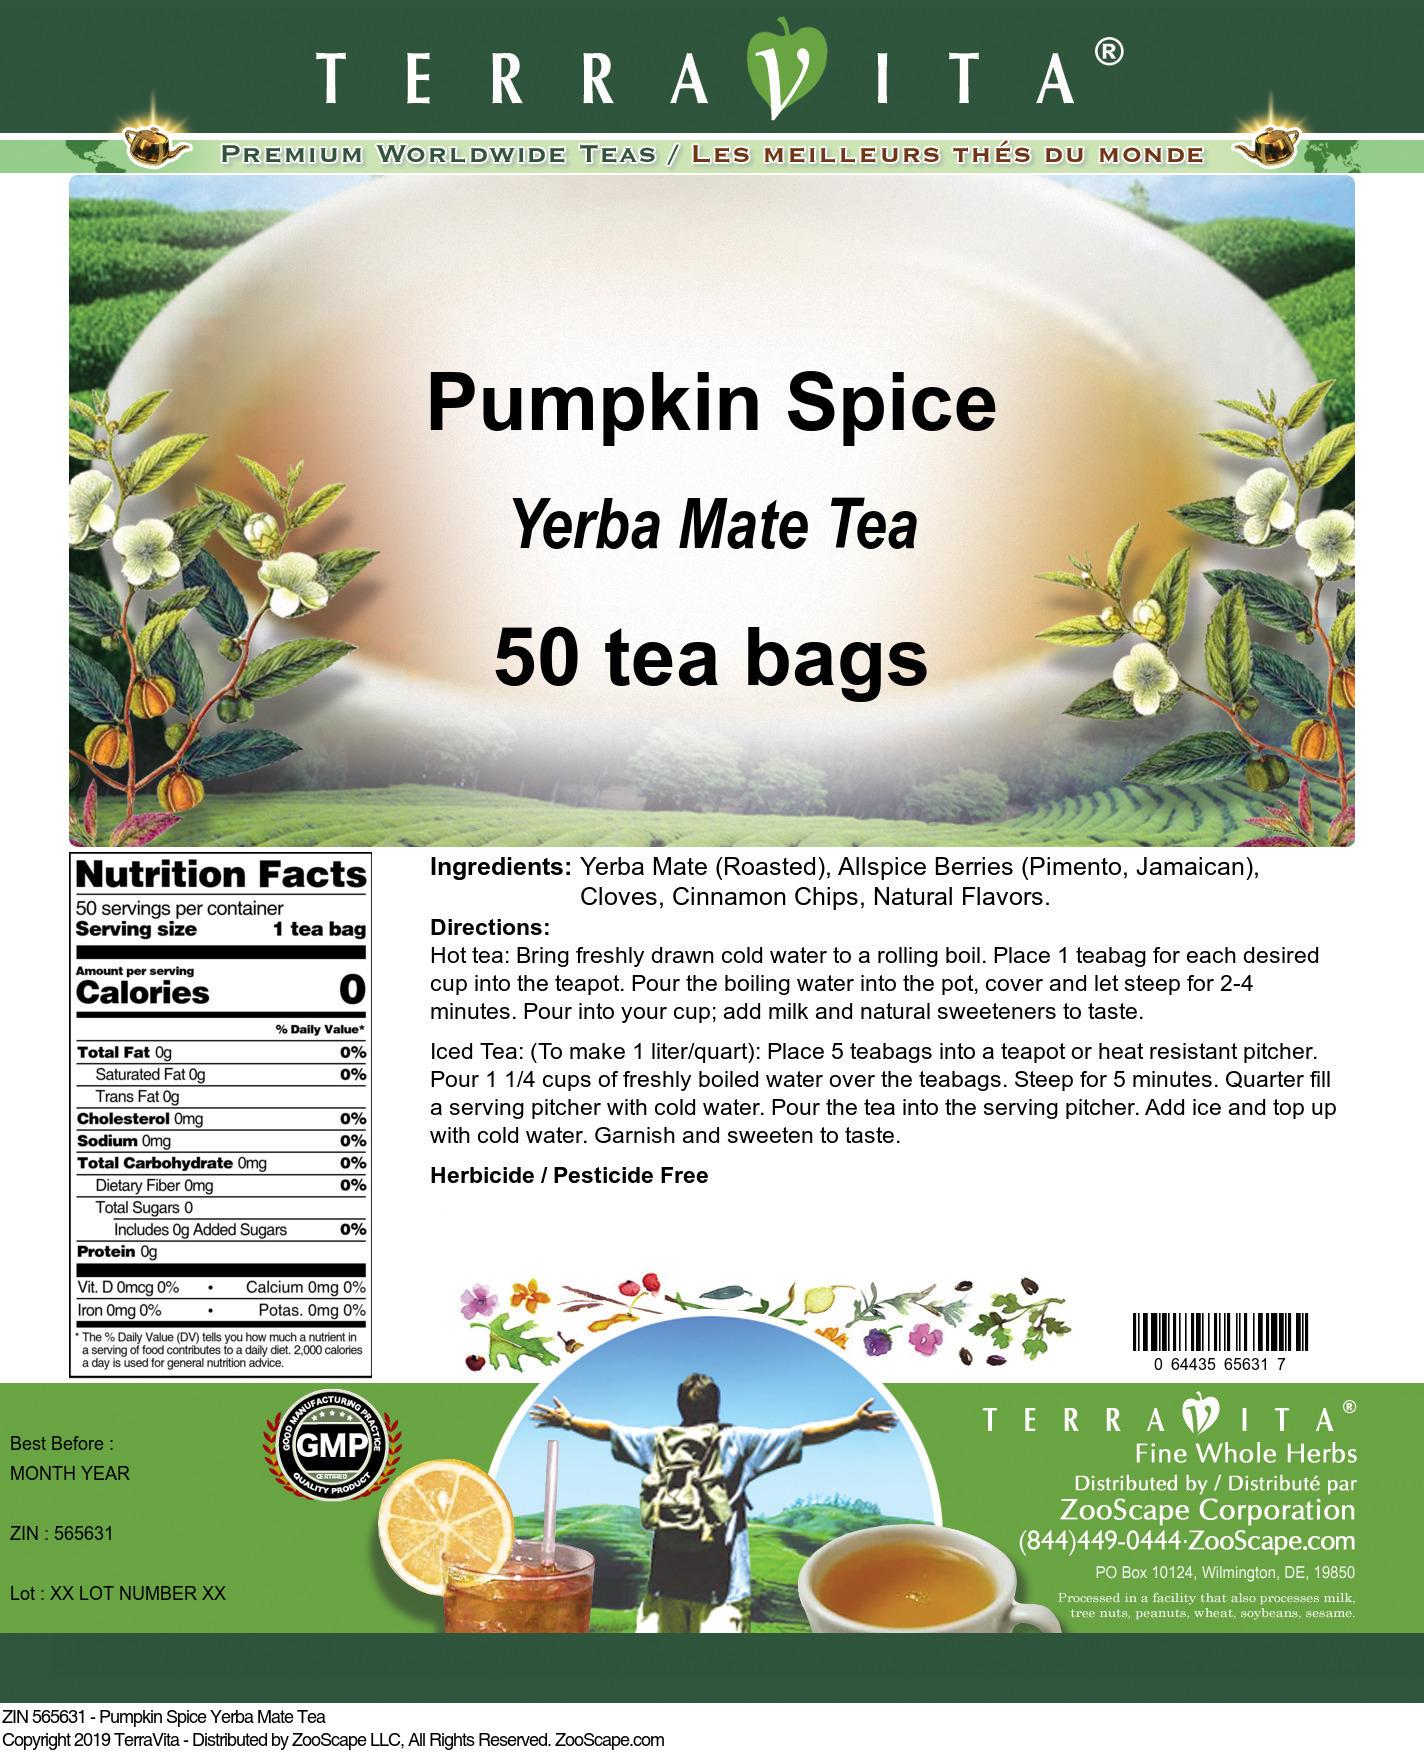 Pumpkin Spice Yerba Mate Tea